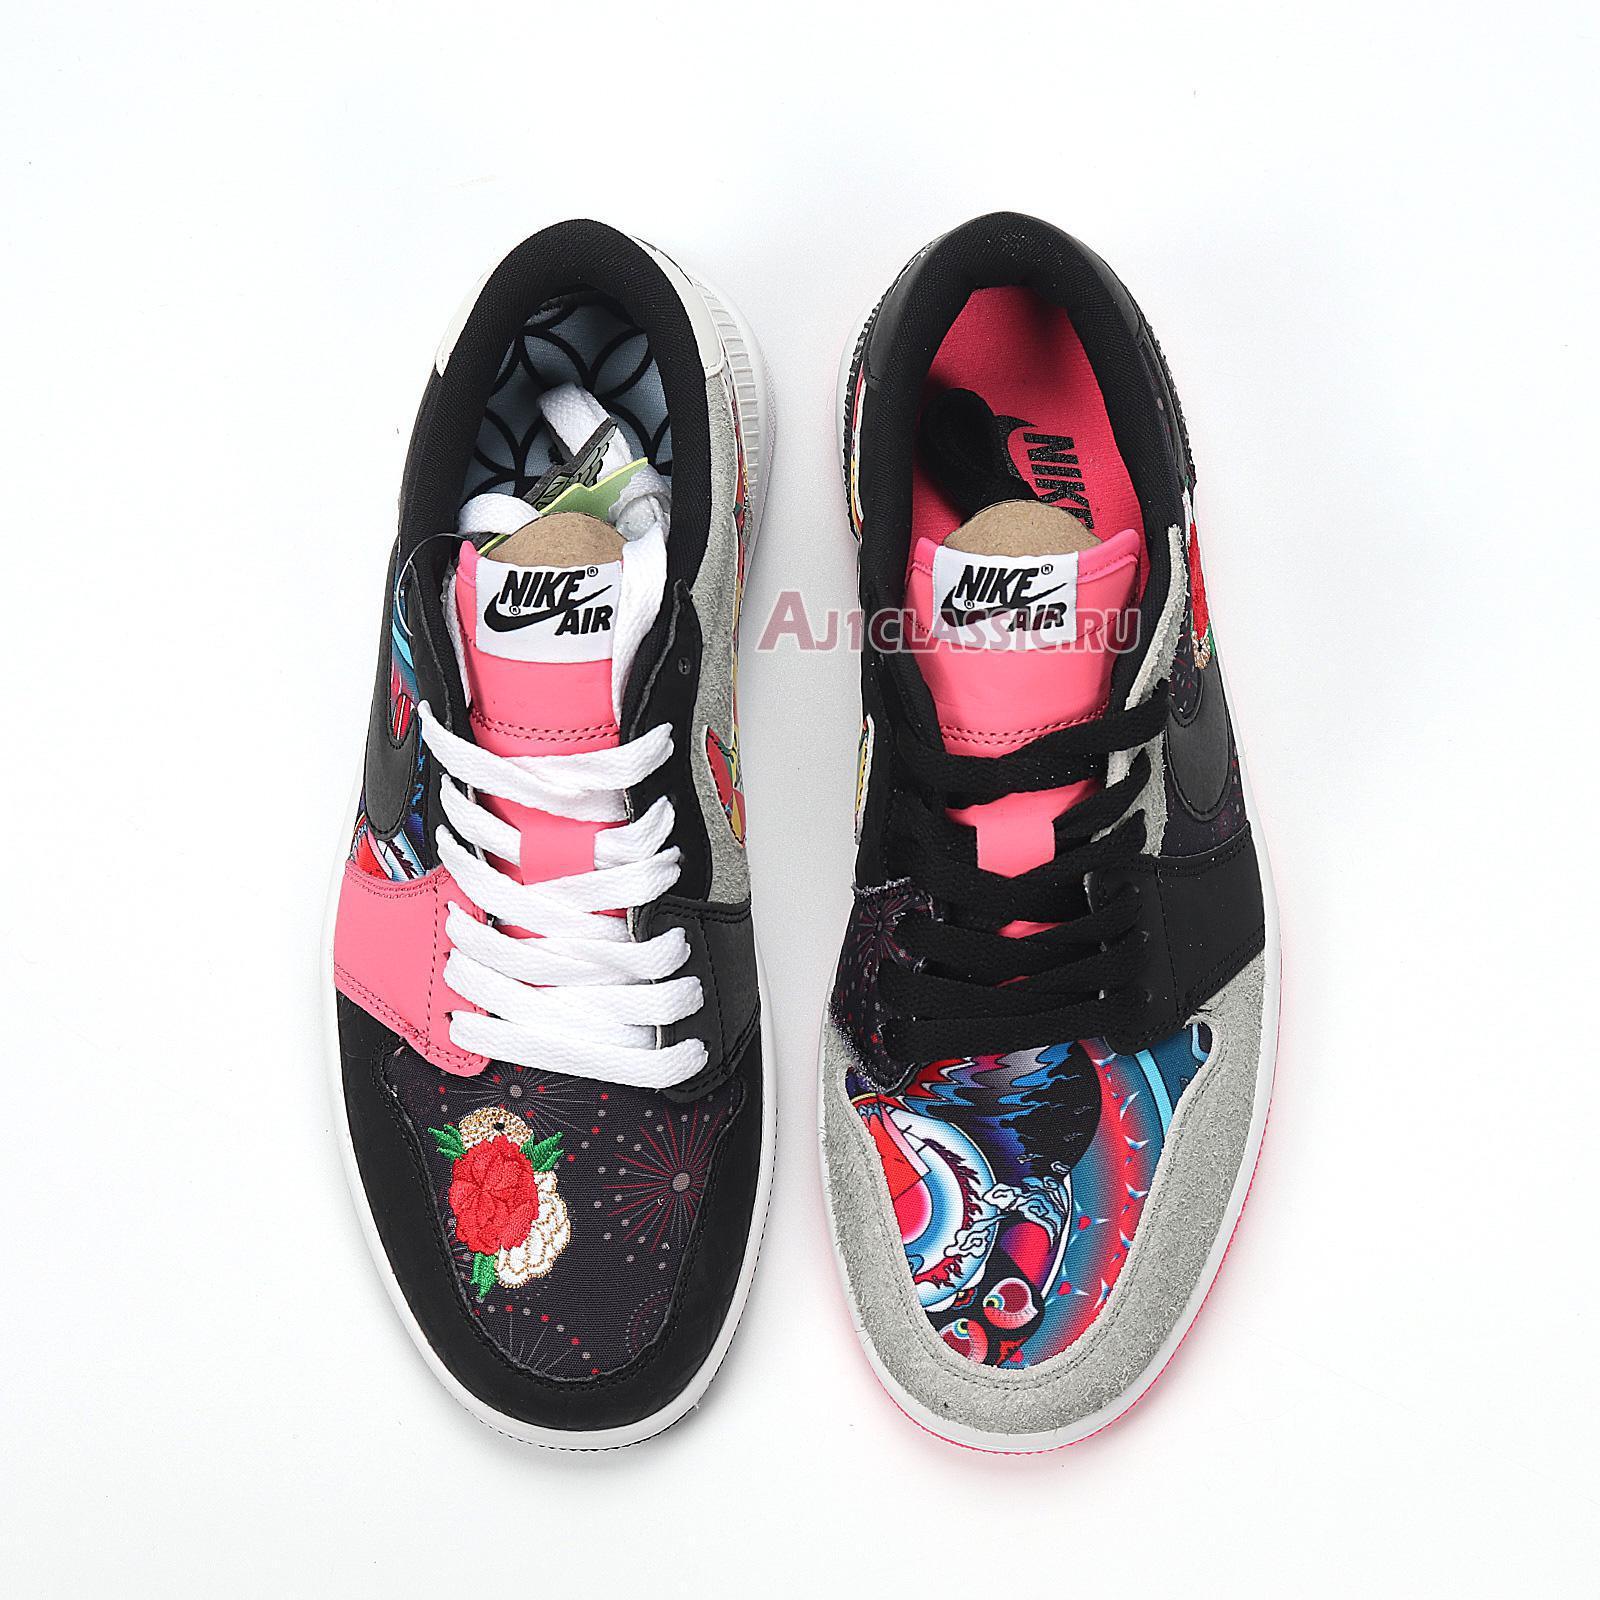 "Air Jordan 1 Low OG ""Chinese New Year"" CW0418-006"